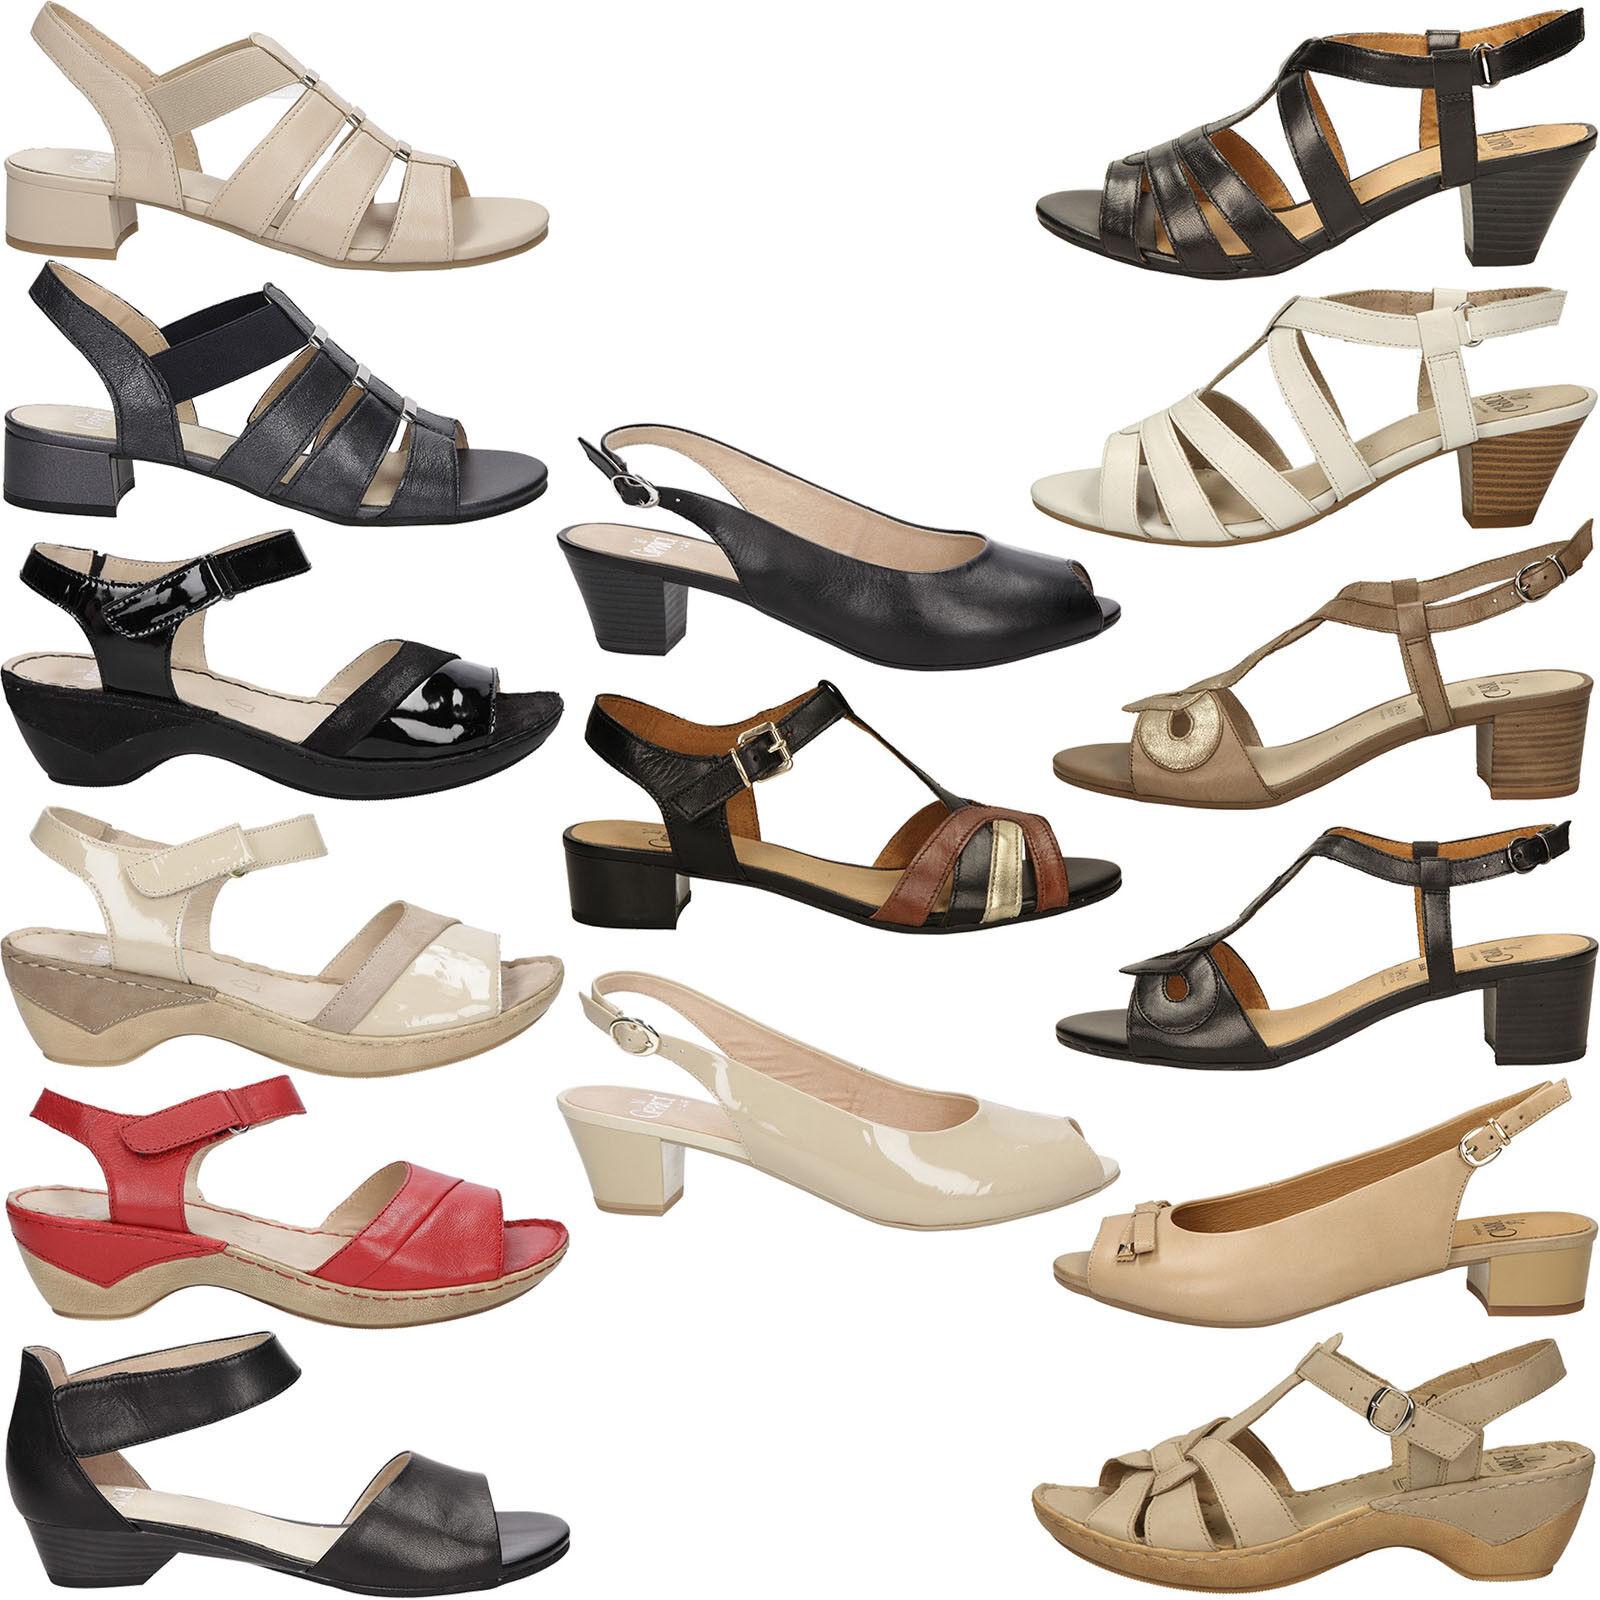 Damen Sandale Caprice Echtleder Blockabsatz Komfortable Sommer Gr.36-42 NEU